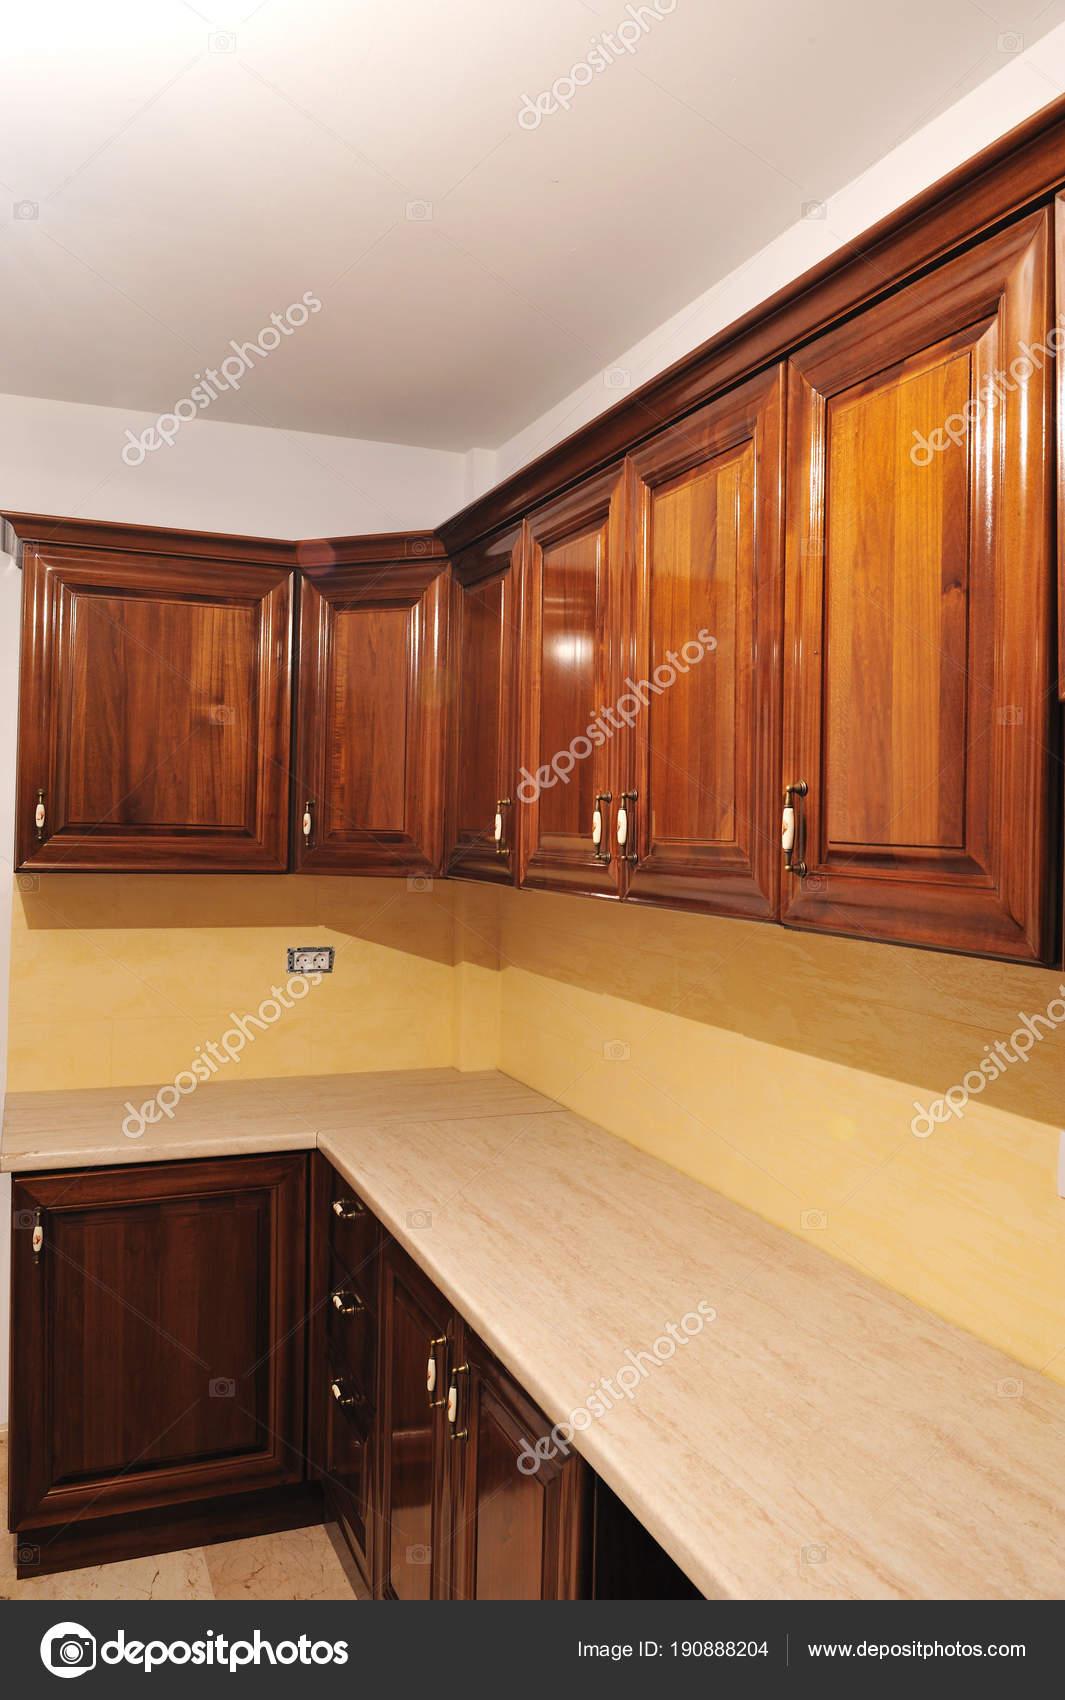 Fotos: muebles | Muebles Cocina Muebles Cocina Modular ...